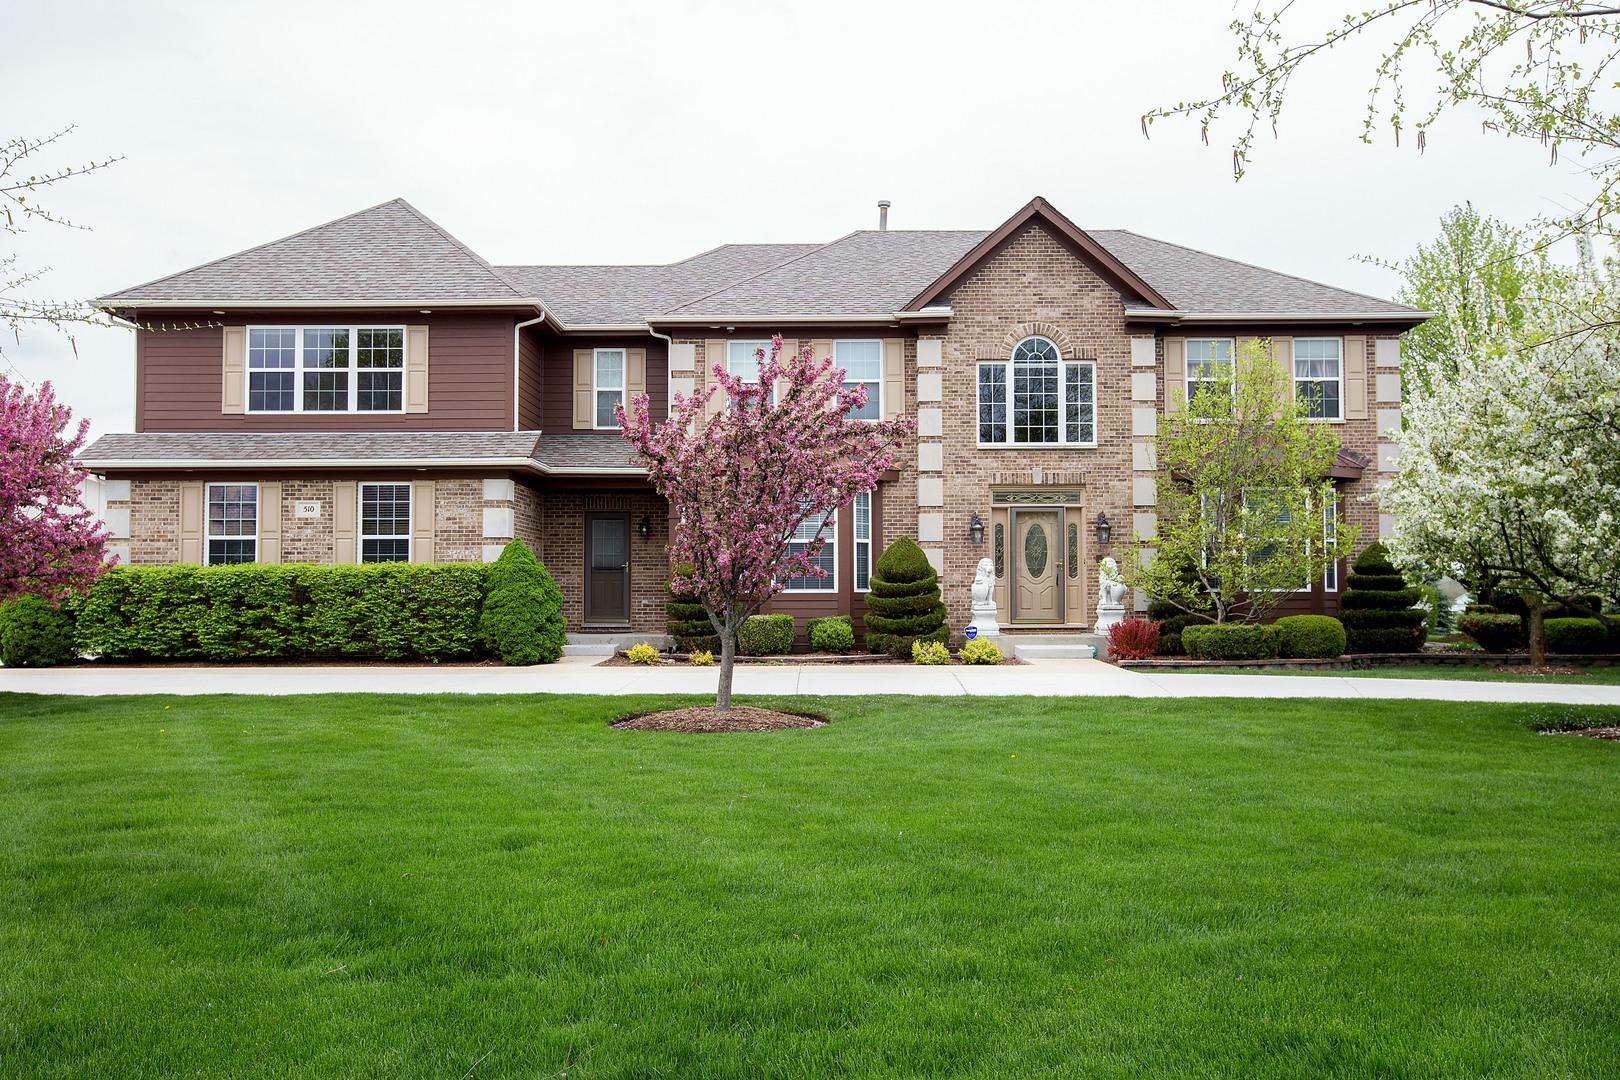 510 Pond Gate Drive, Barrington Hills, Illinois 60010